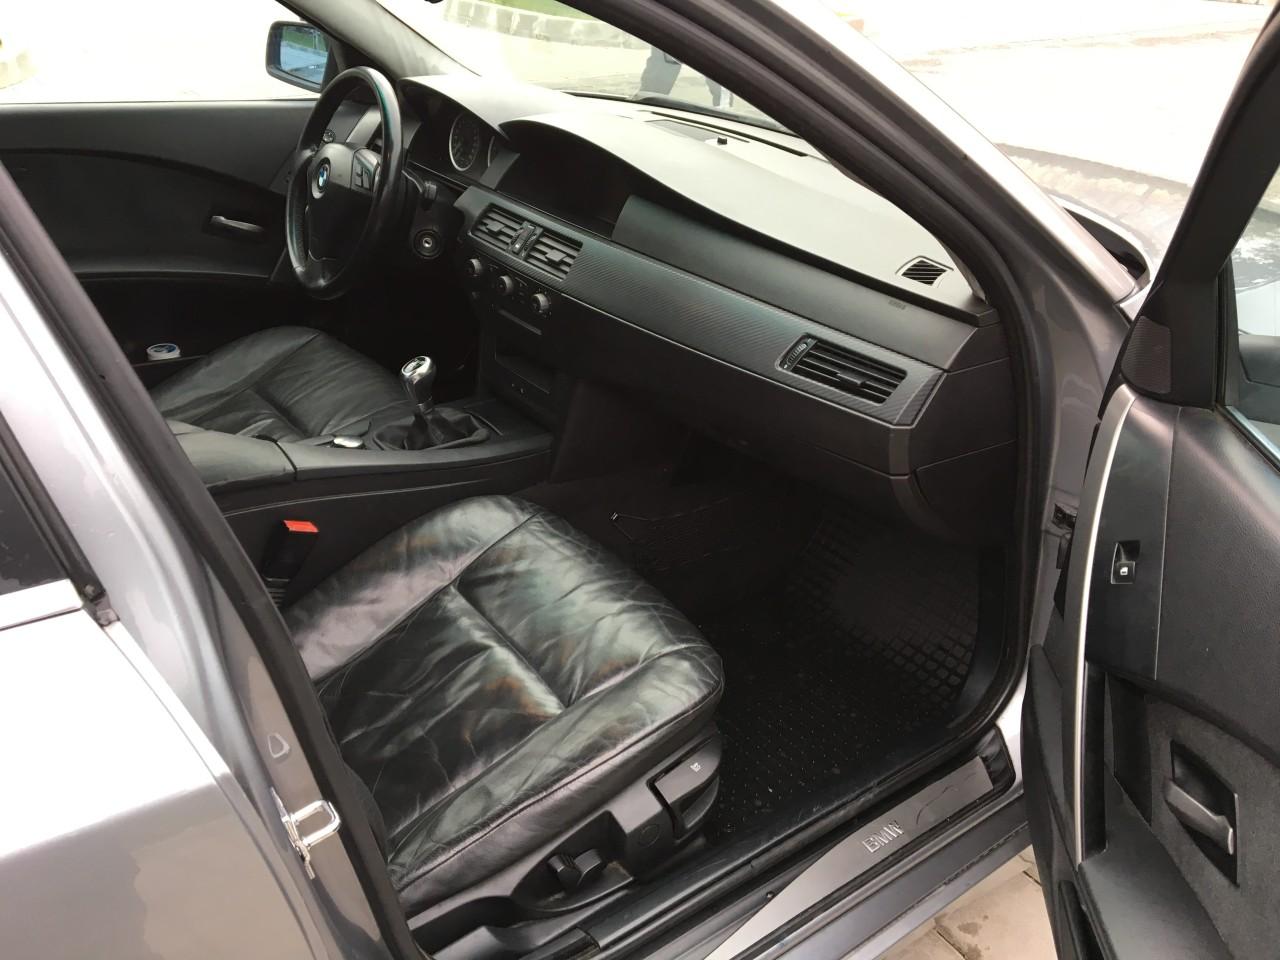 BMW 525 2.5 diesel 2005